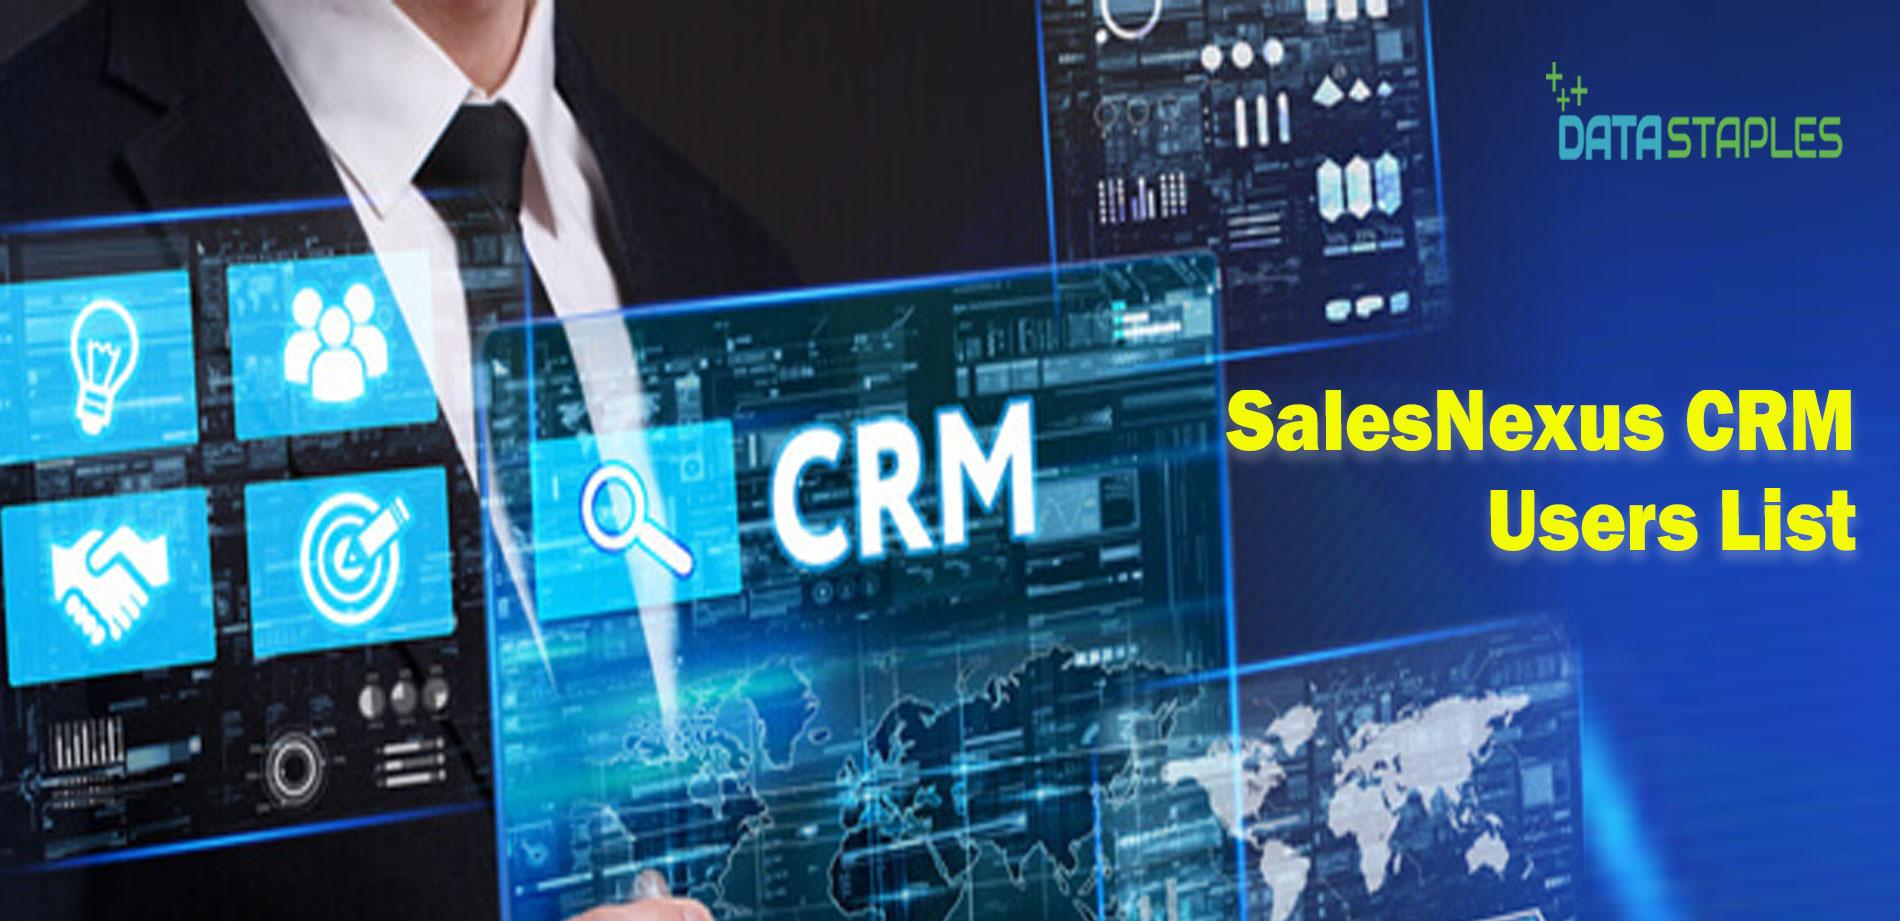 SalesNexus CRM Users Mailing List | DataStaples